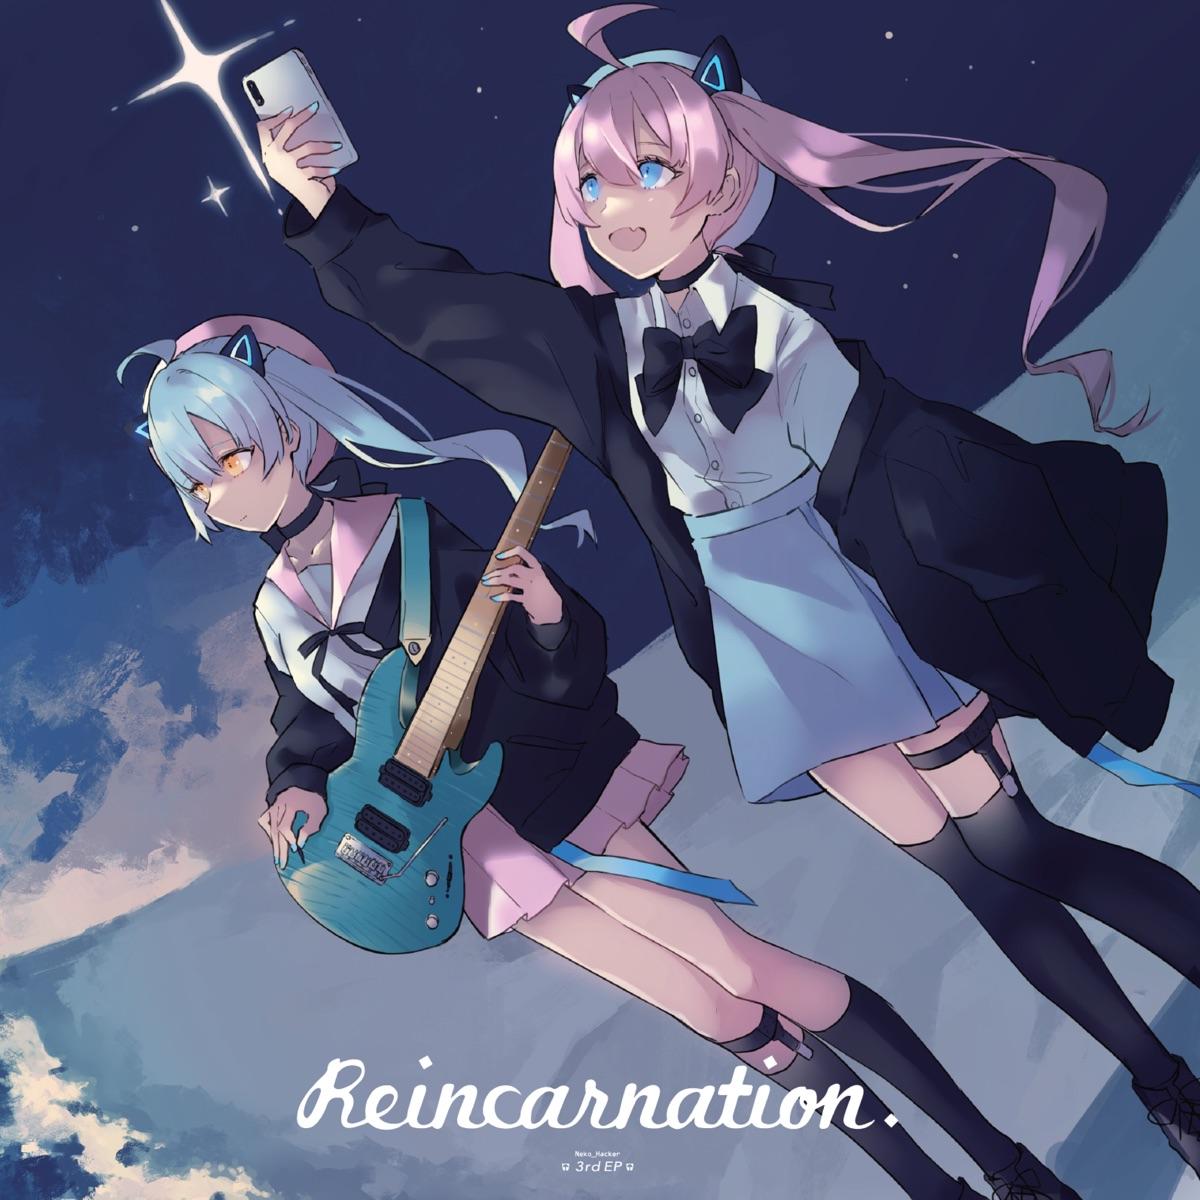 『Neko Hacker - Pictures feat. 4s4ki』収録の『Reincarnation』ジャケット